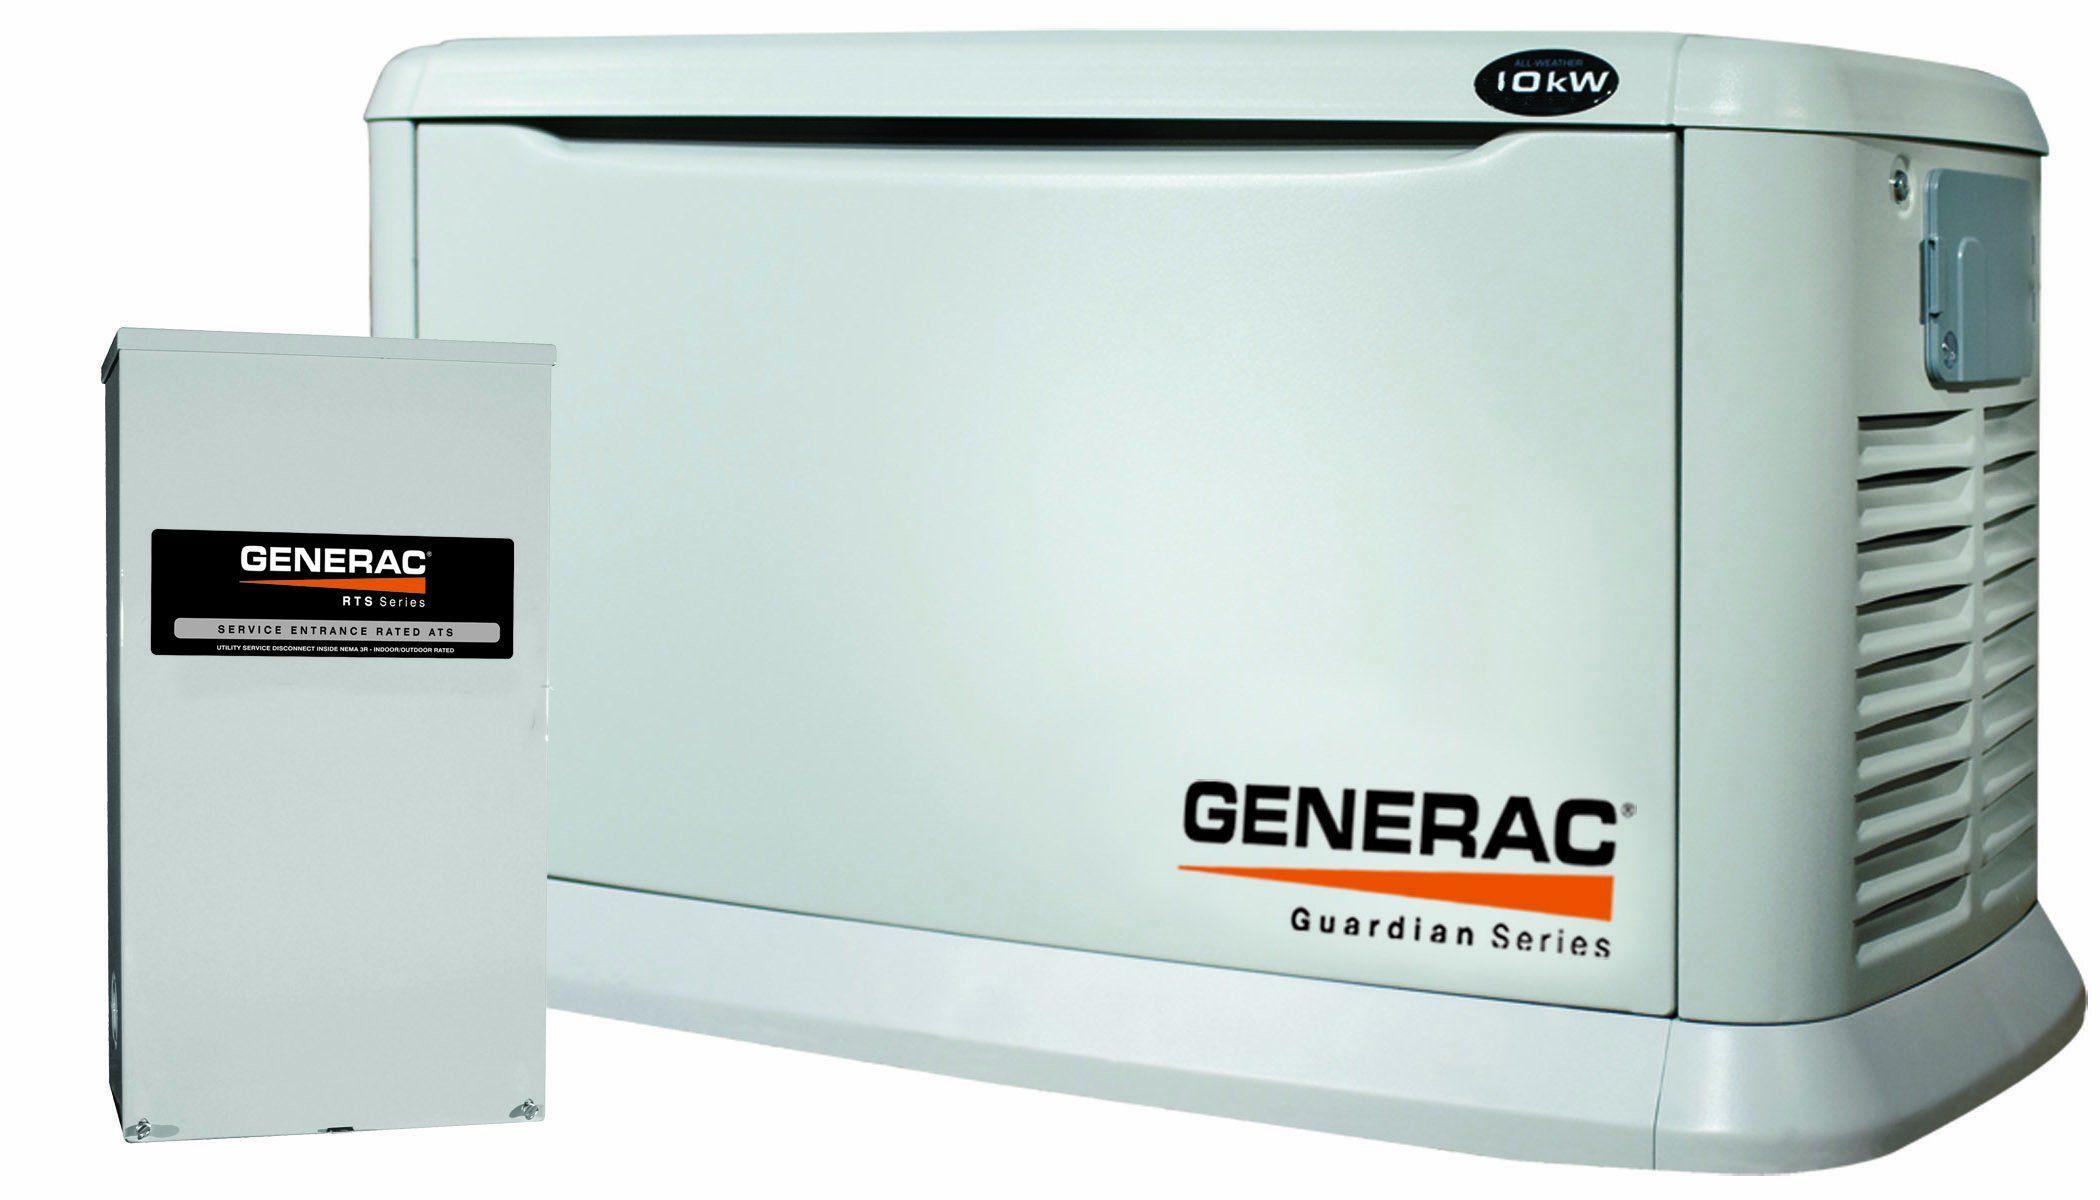 Generac 10kw Standby Generators Norwall Generator House